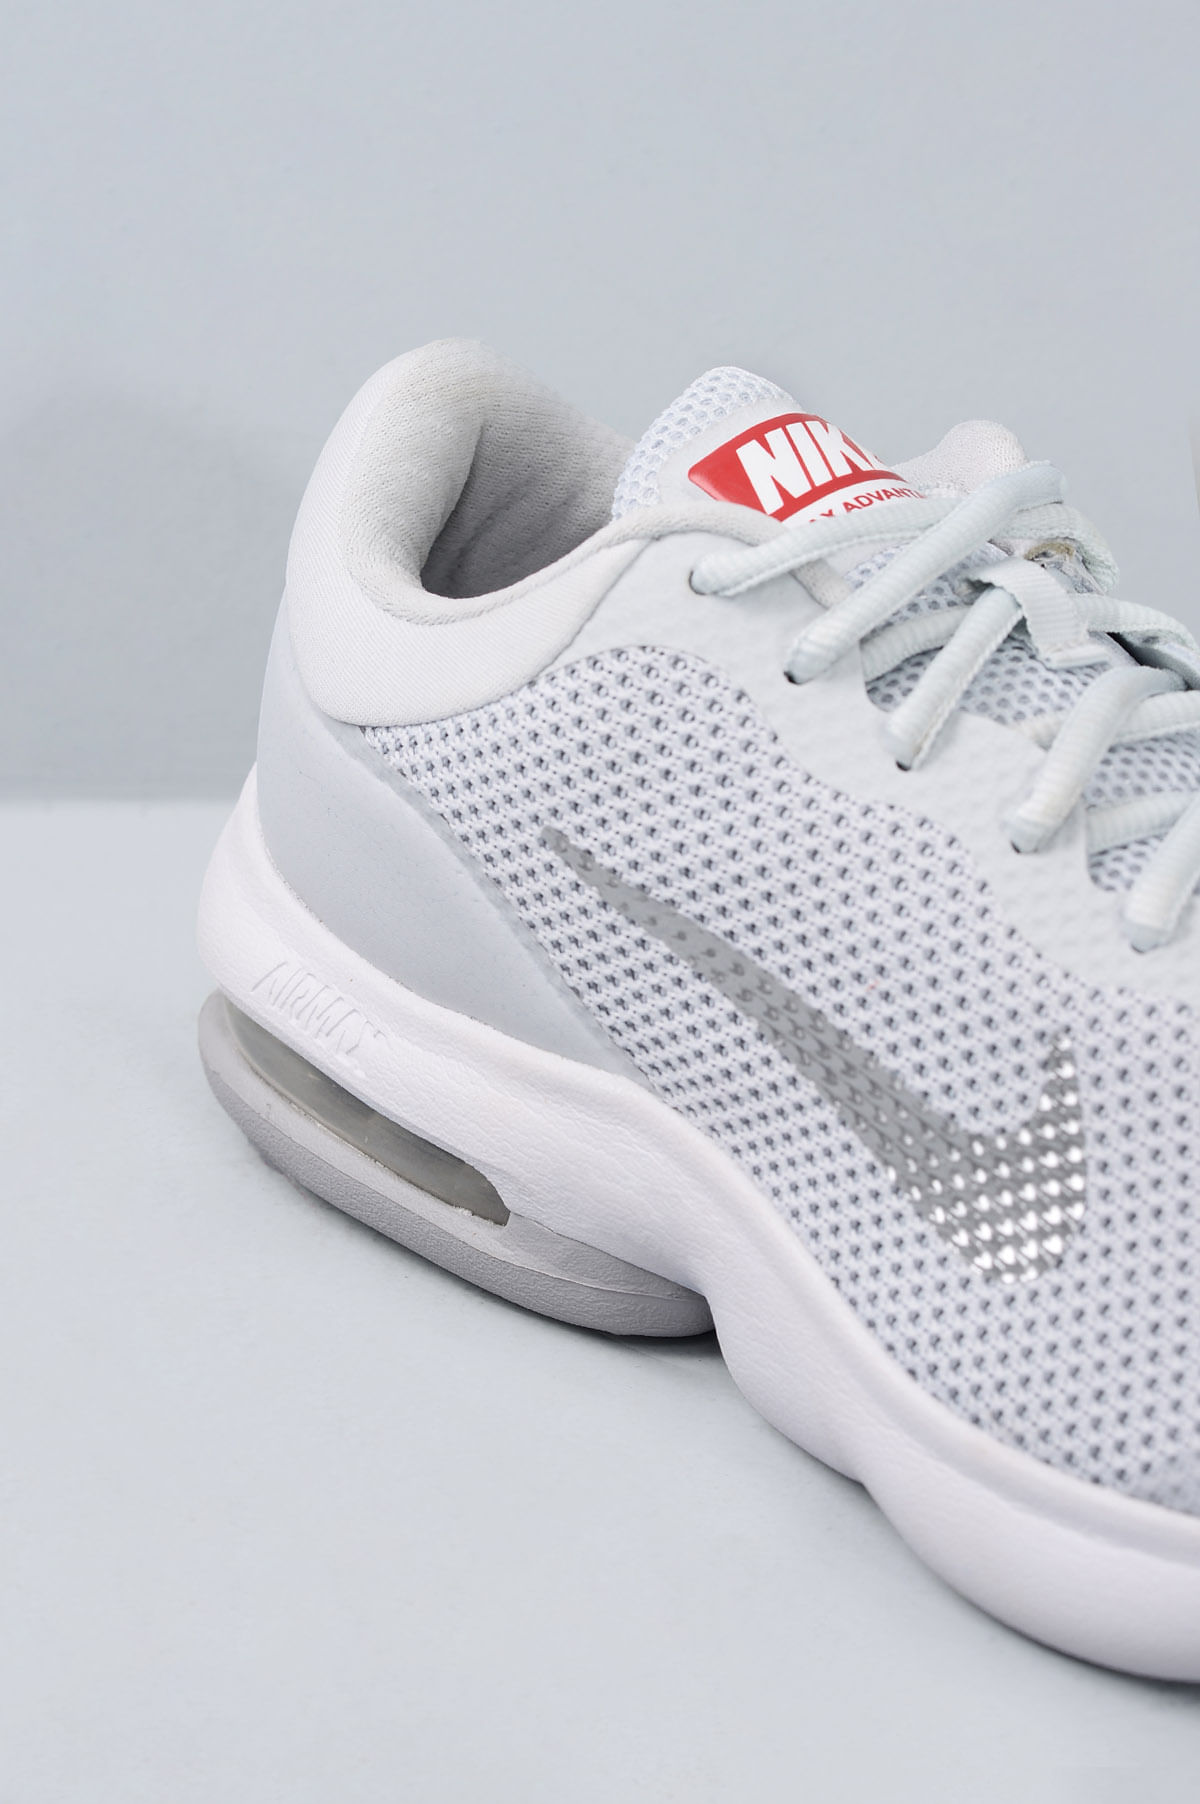 Tênis Masculino Nike Air Max Advantage Tec Prata Mundial